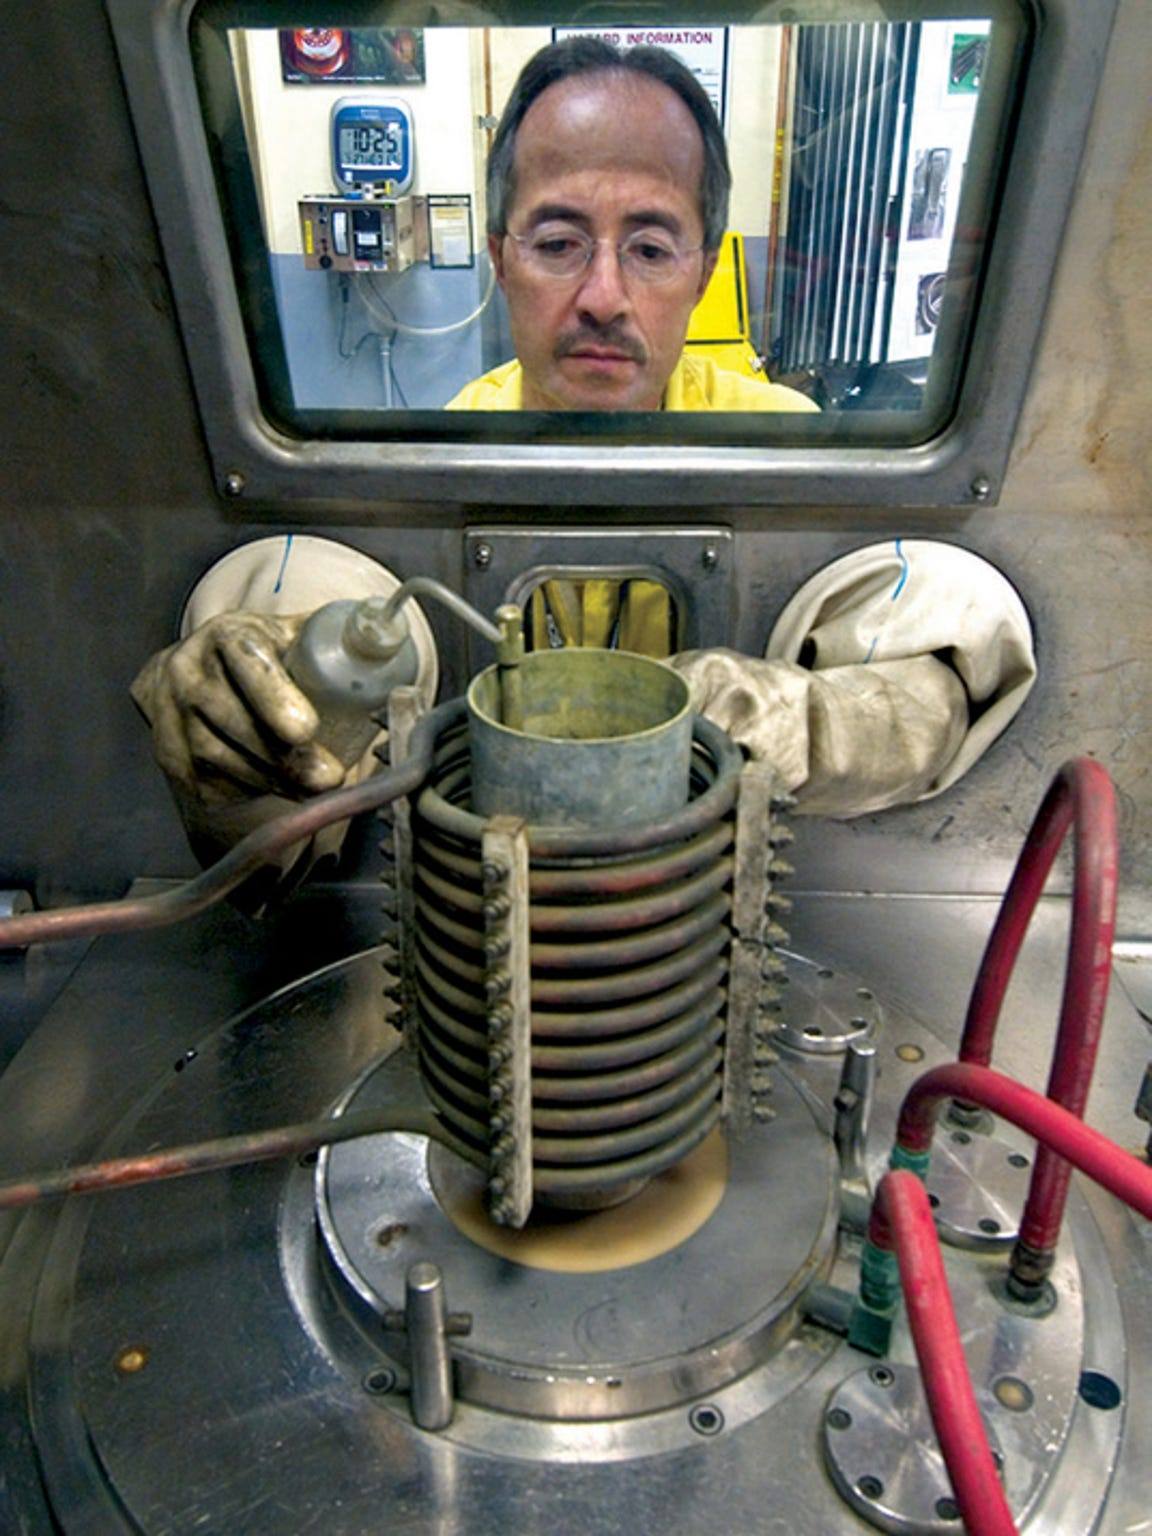 Plutonium work at Los Alamos generally takes place